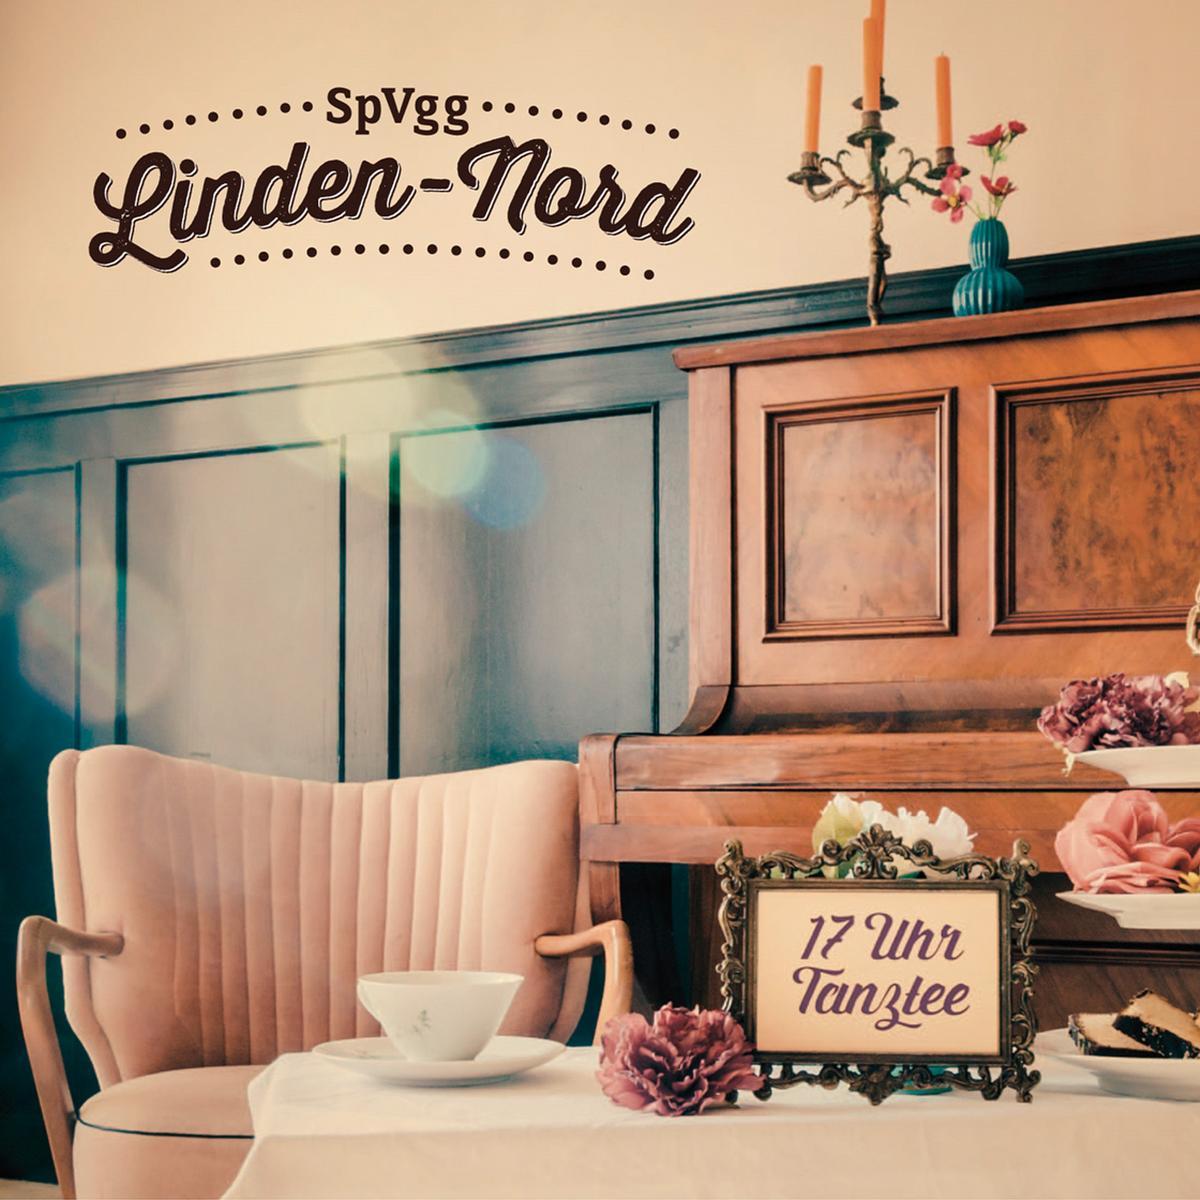 17 Uhr Tanztee -  SpVgg Linden Nord